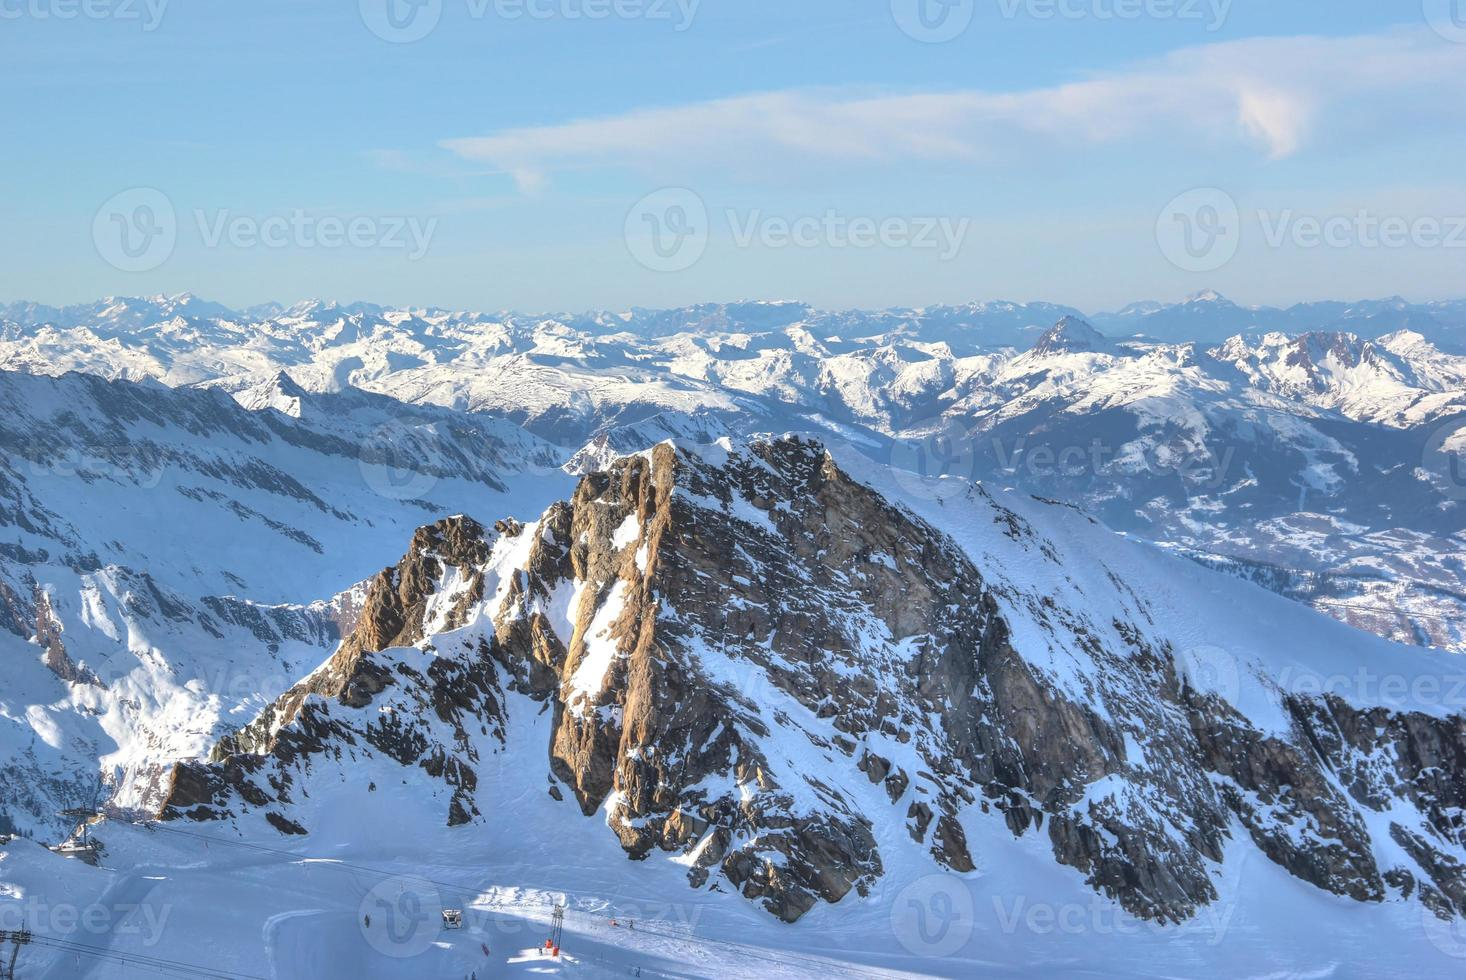 vistas fabulosas - área de esqui na montanha kitzsteinhorn, áustria. foto